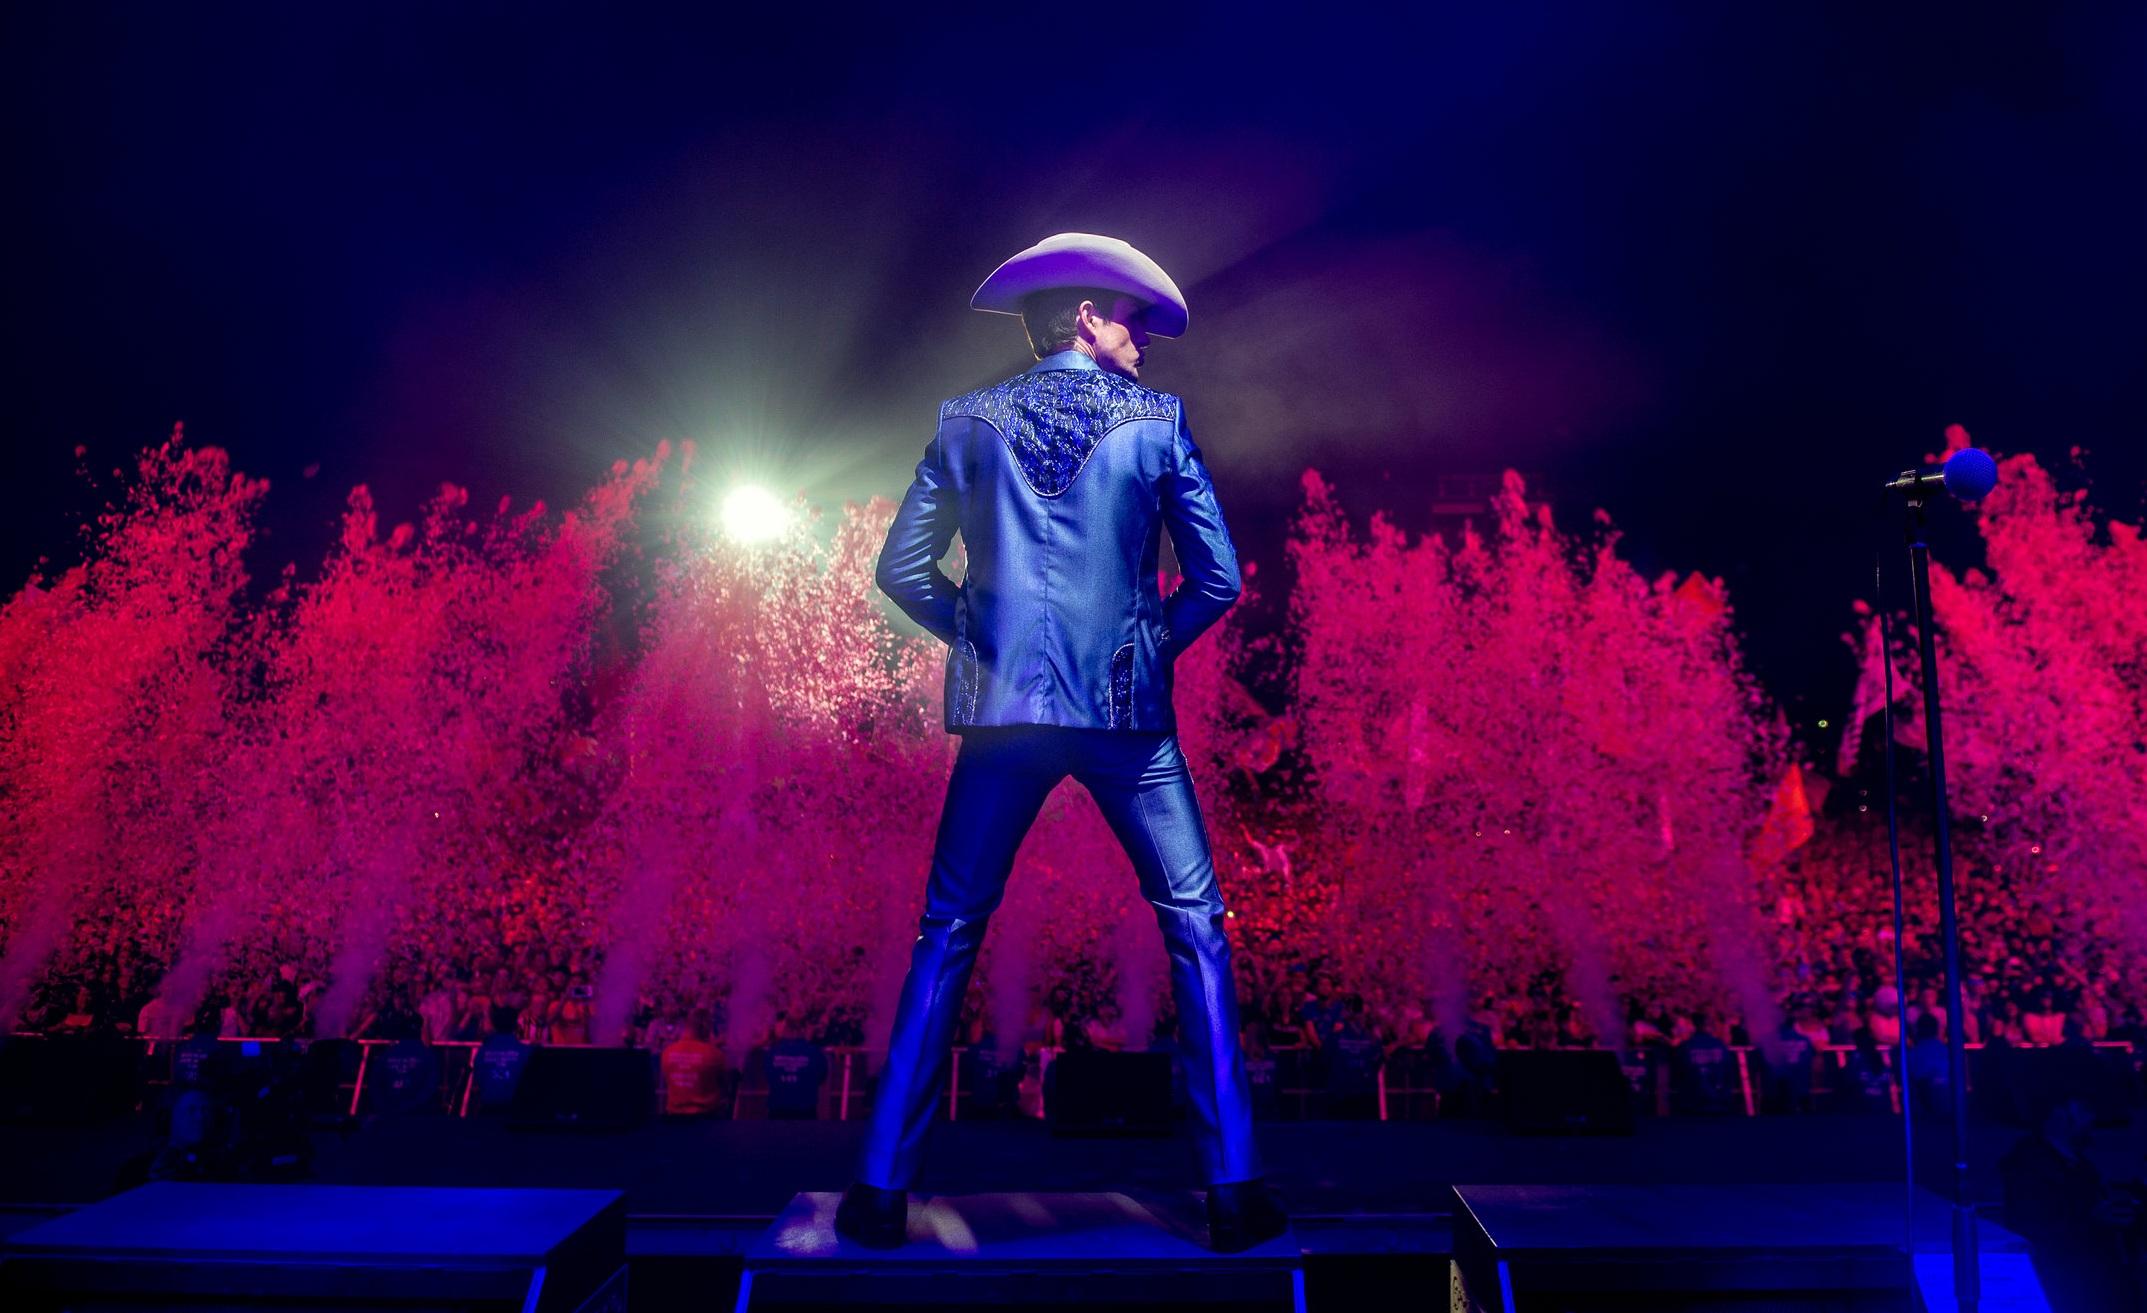 PRINT SALE: Brandon during The Killers headline Glastonbury set, 2019